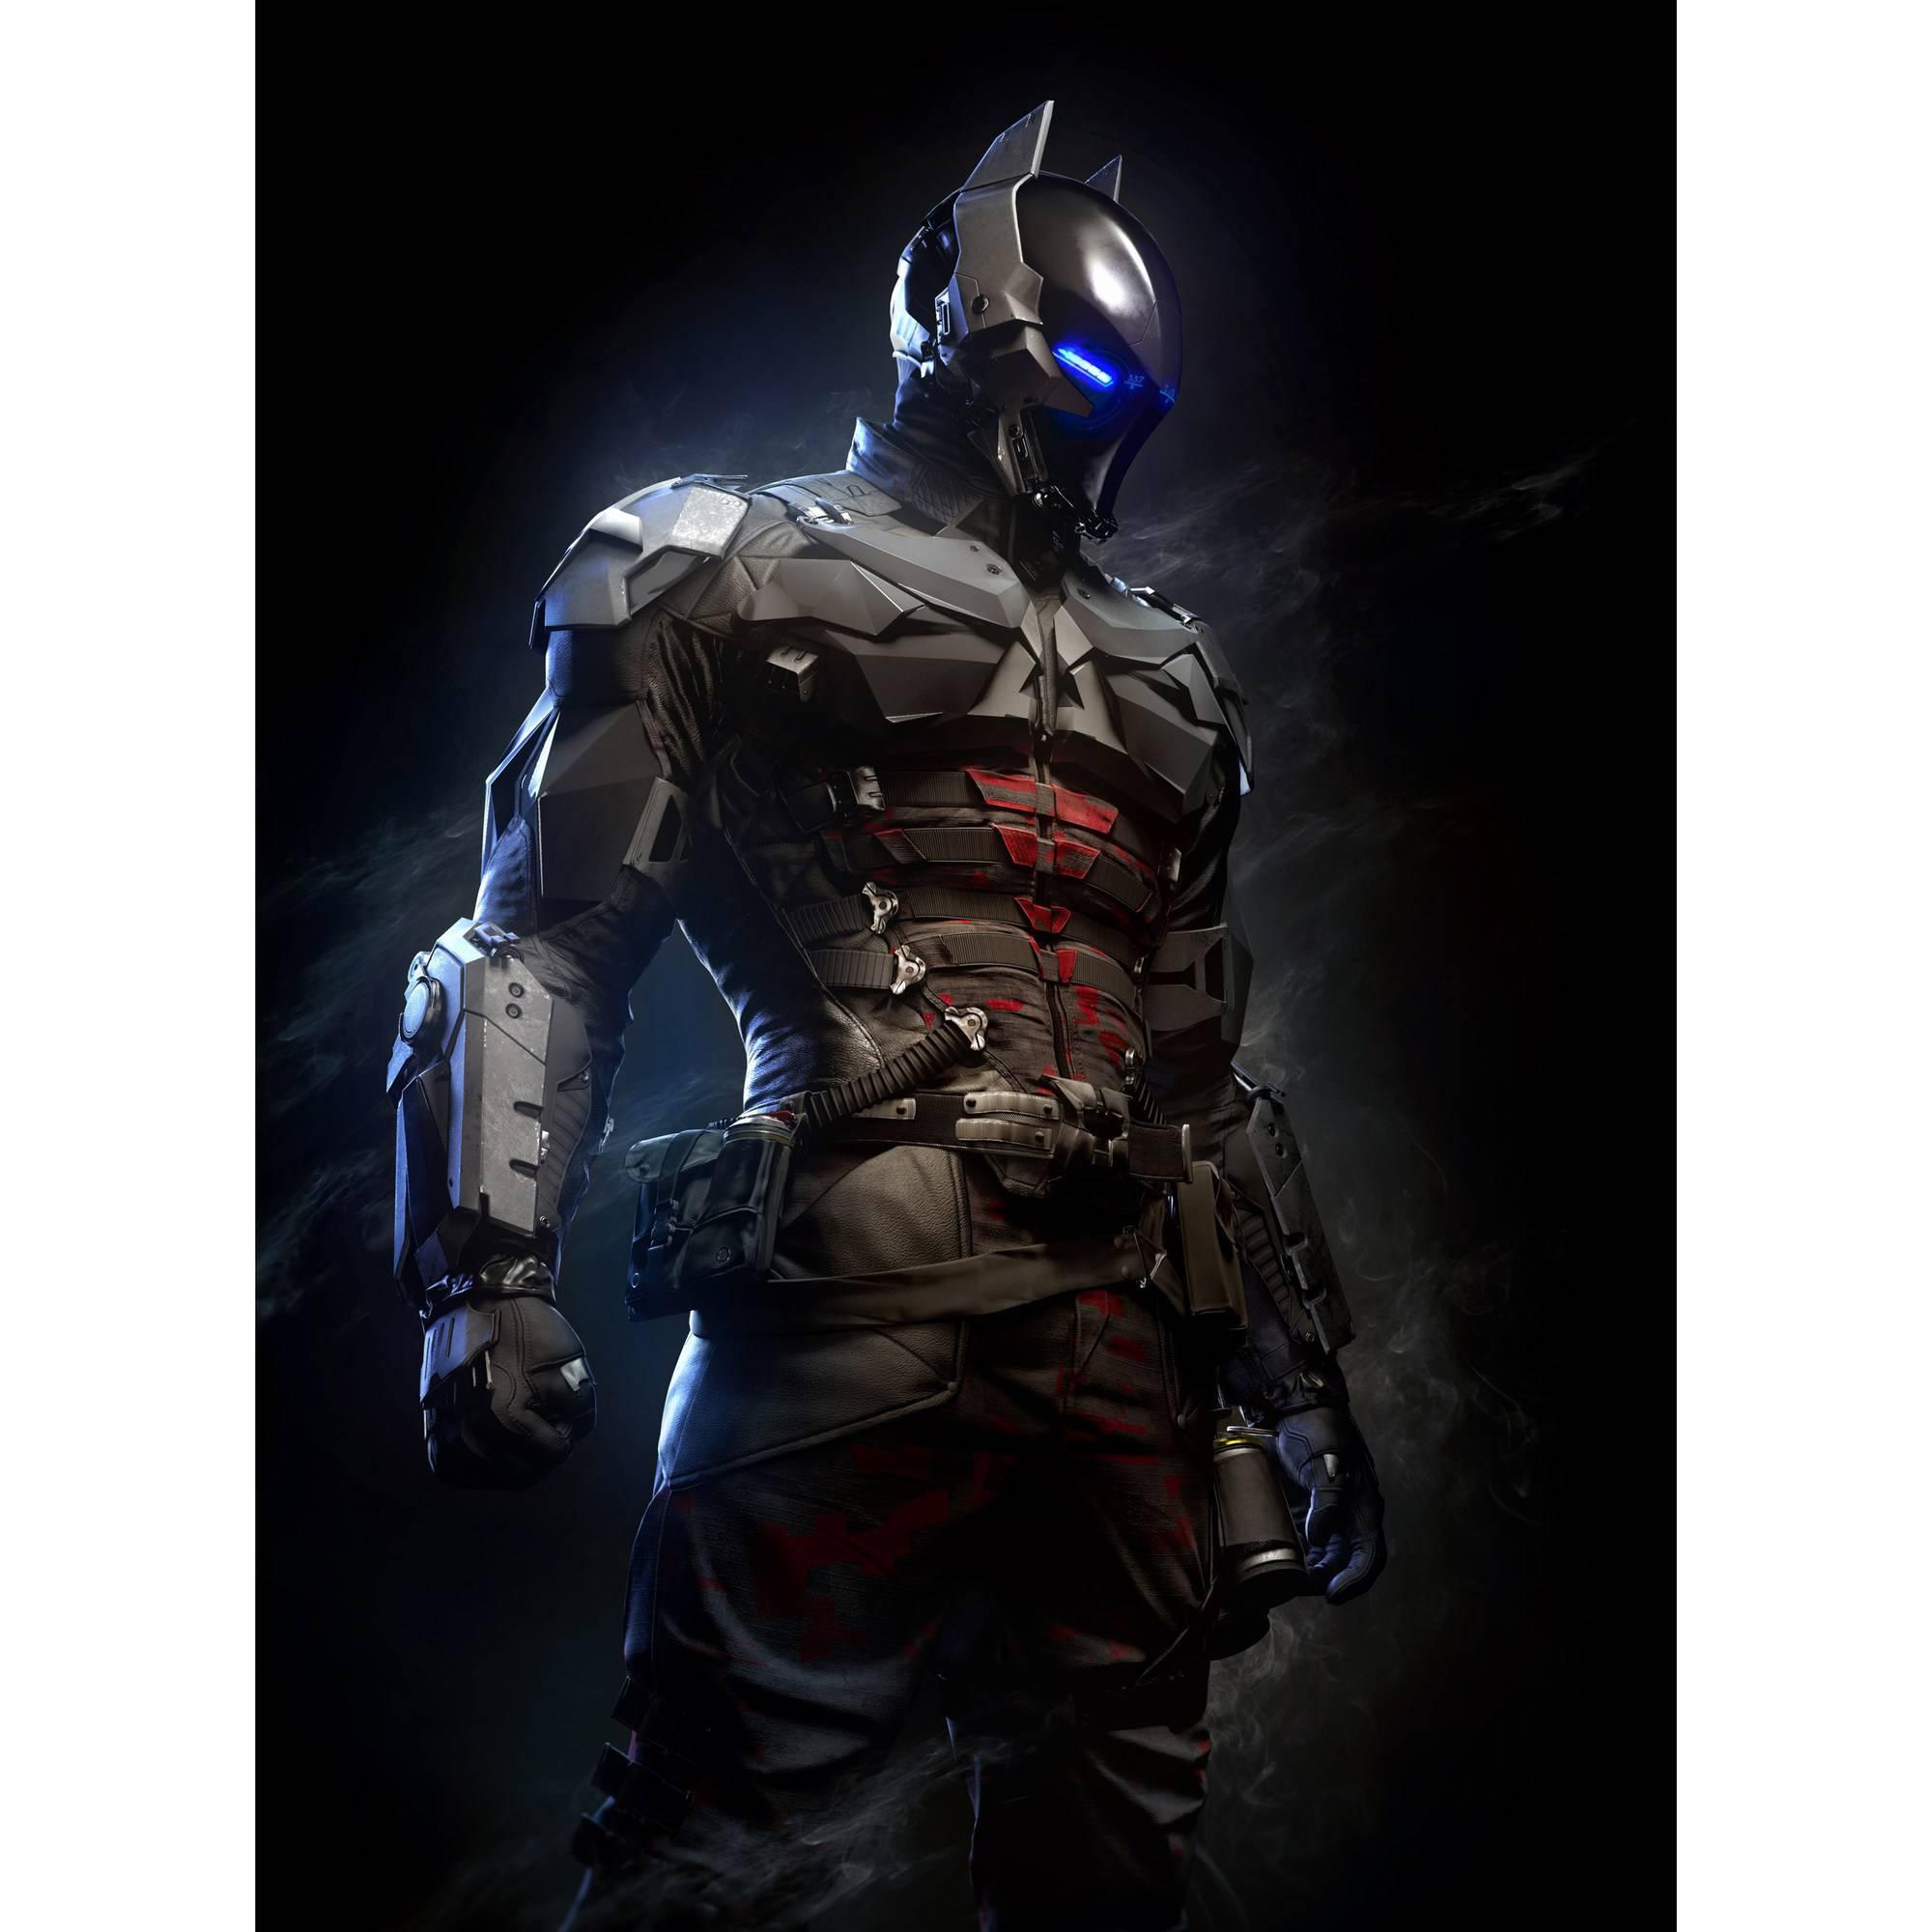 Images of Batman: Arkham Knight | 2000x2000